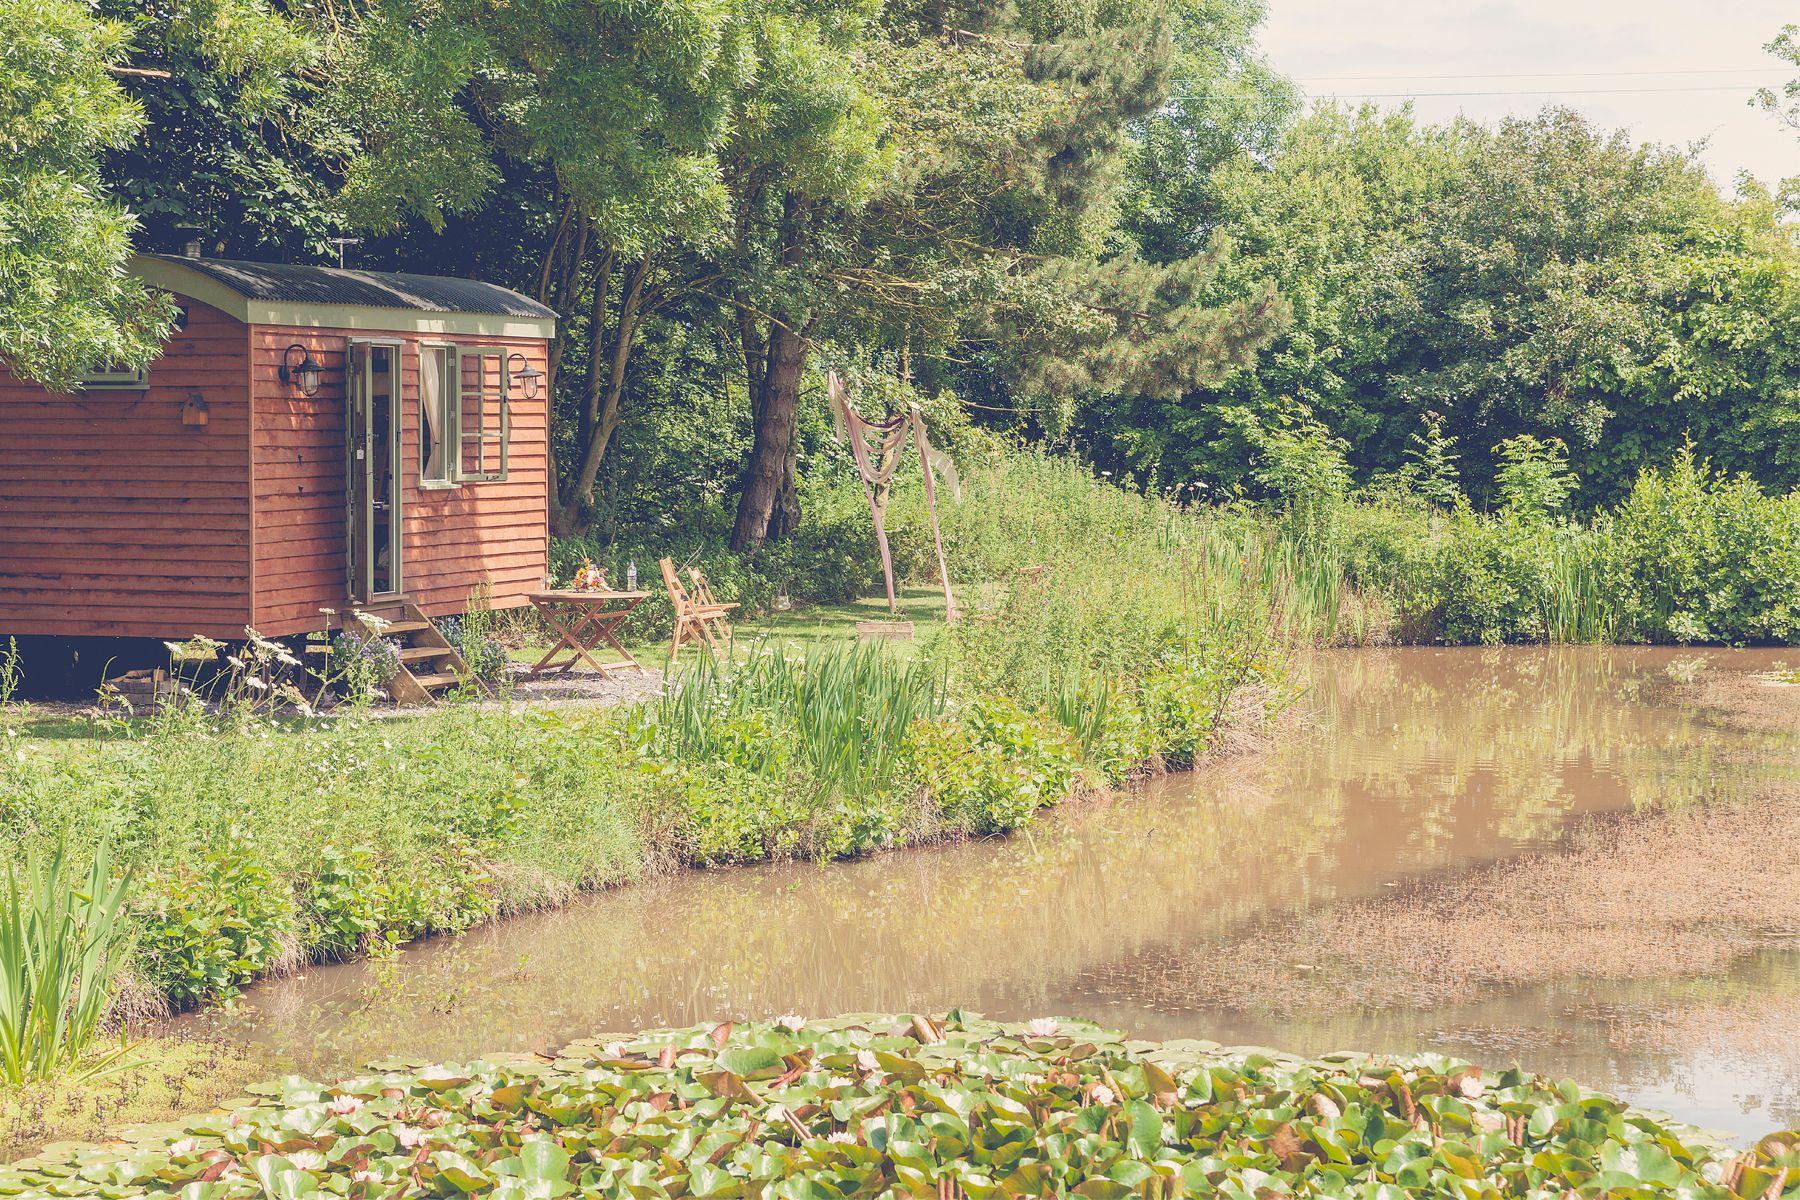 Little Otchan Shepherd Hut